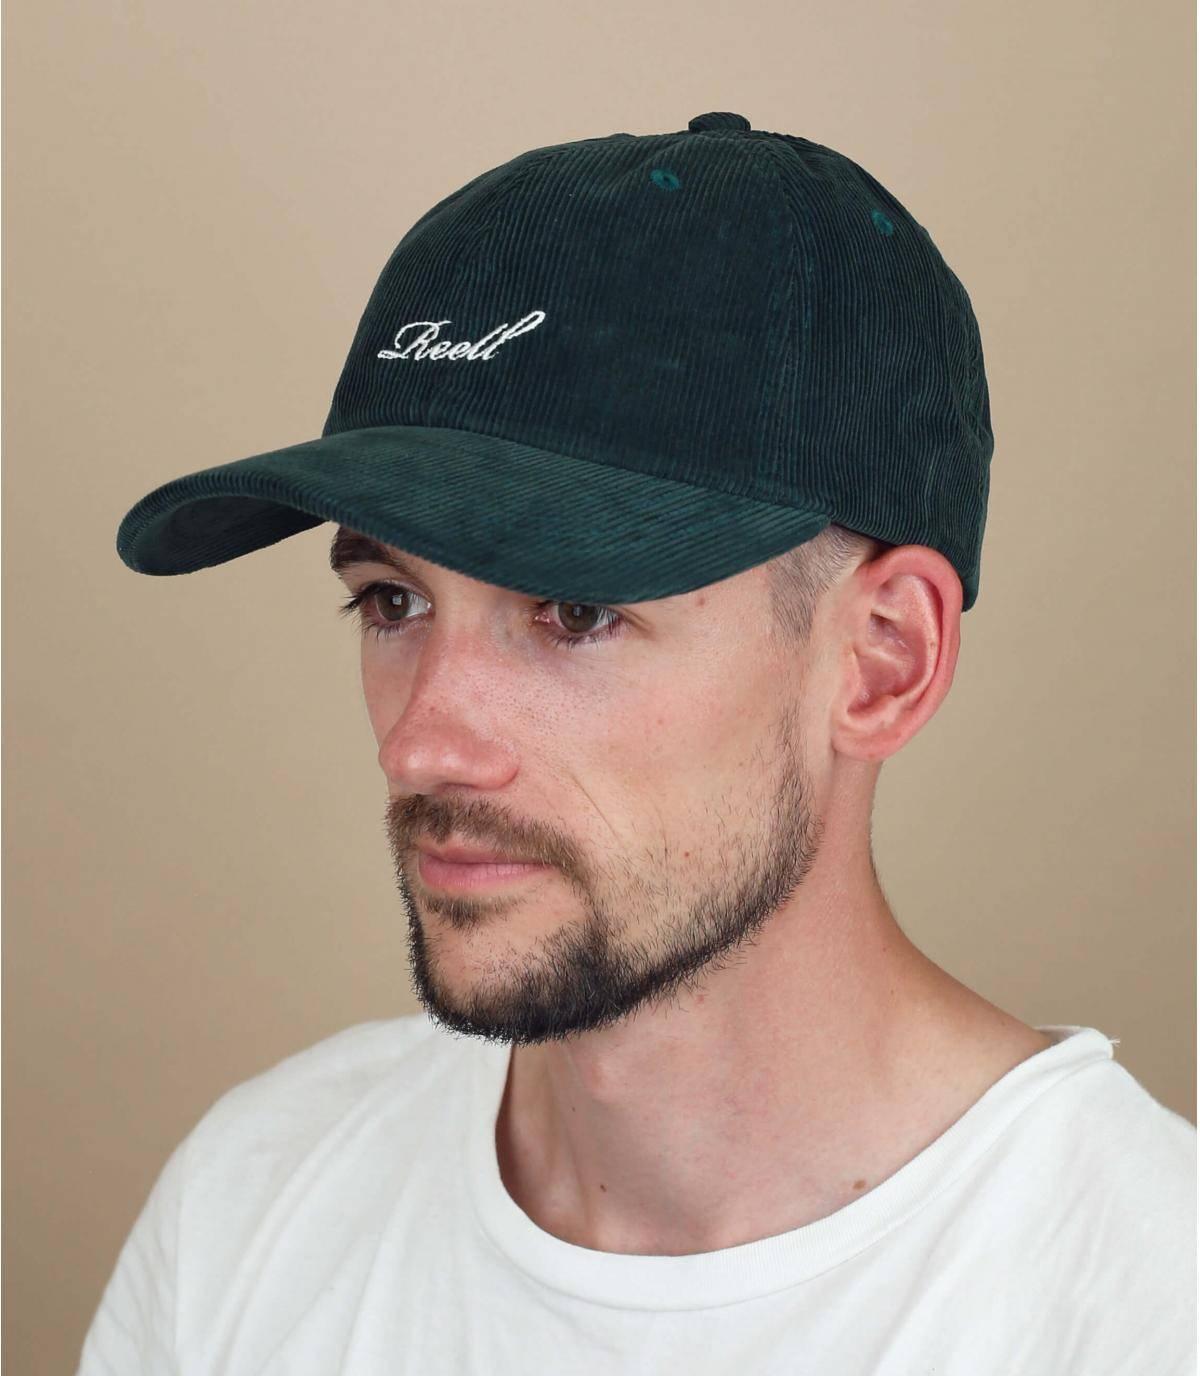 cappellino velluto verde Reell